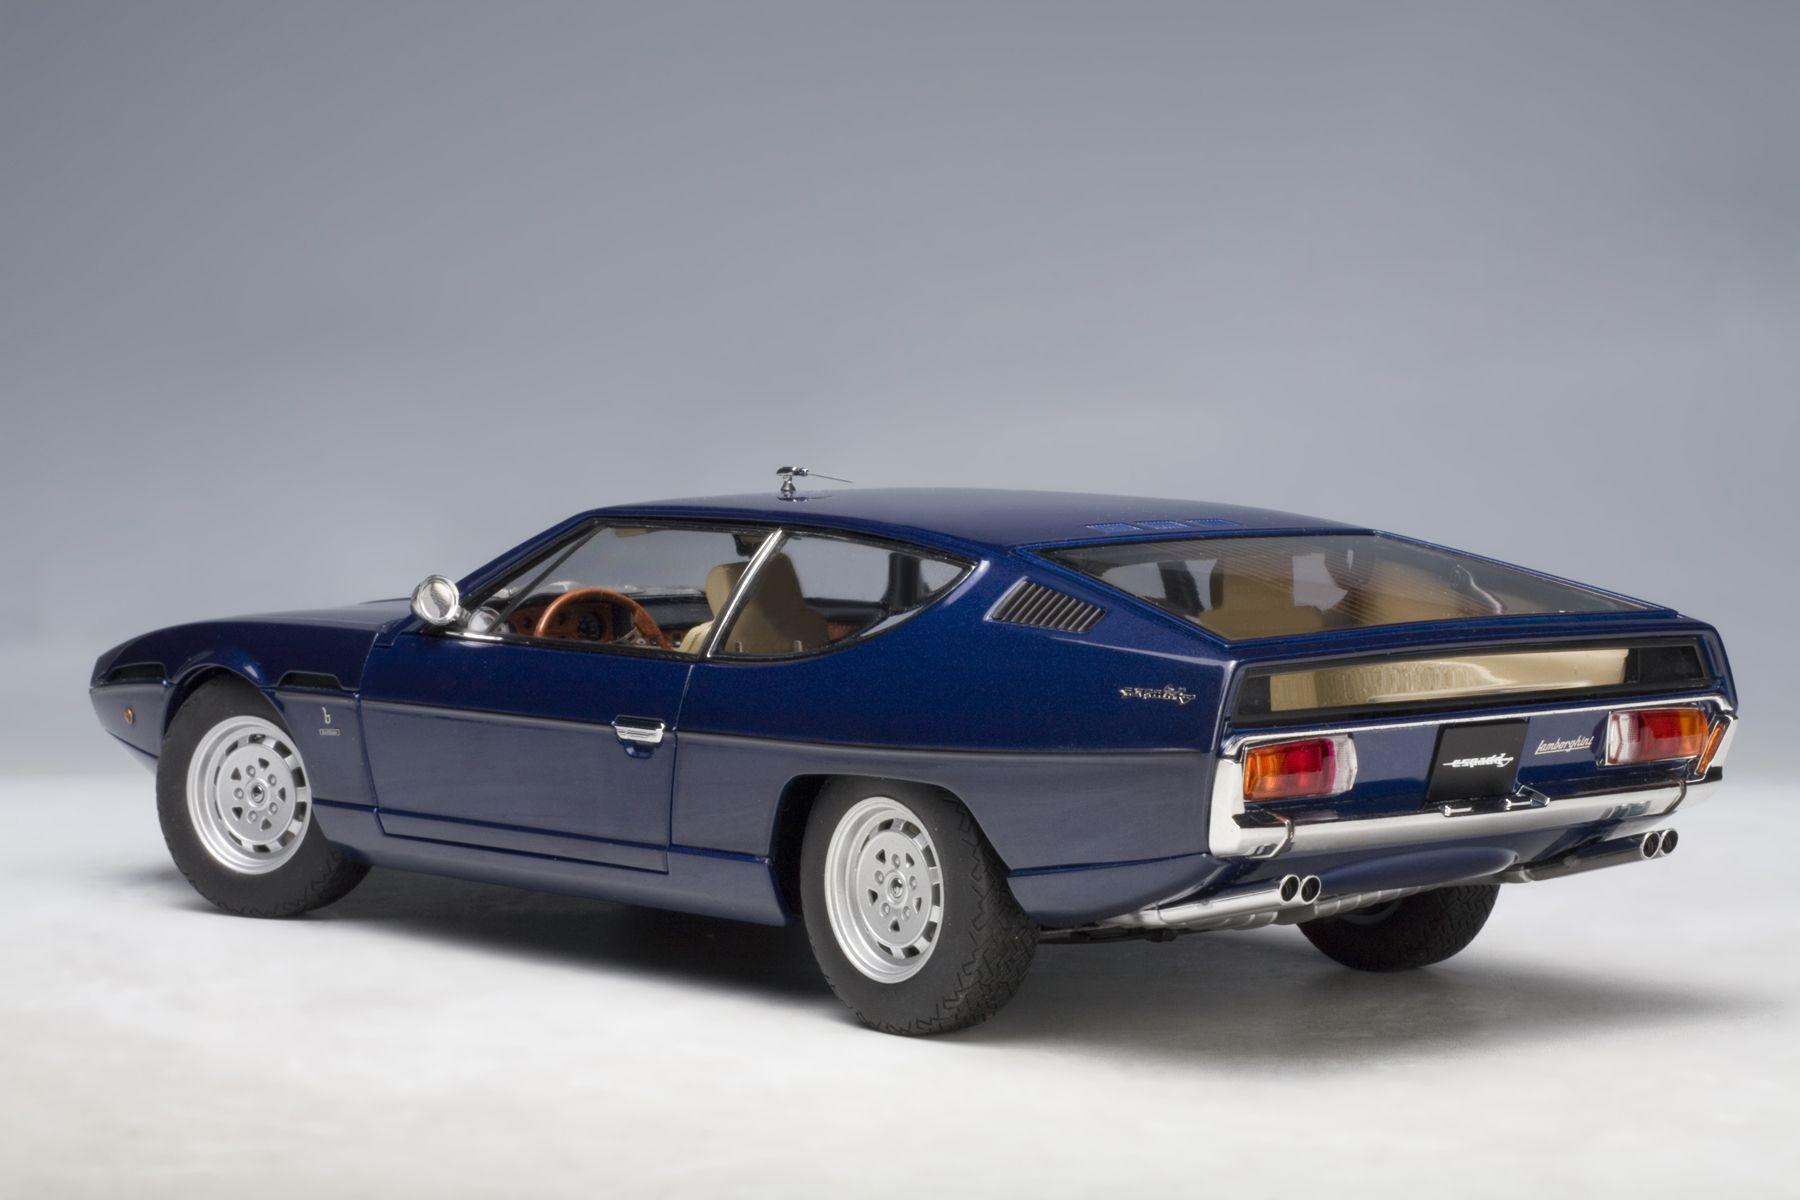 1968 Lamborghini Espada Classic Lamborghini Espada cars for sale